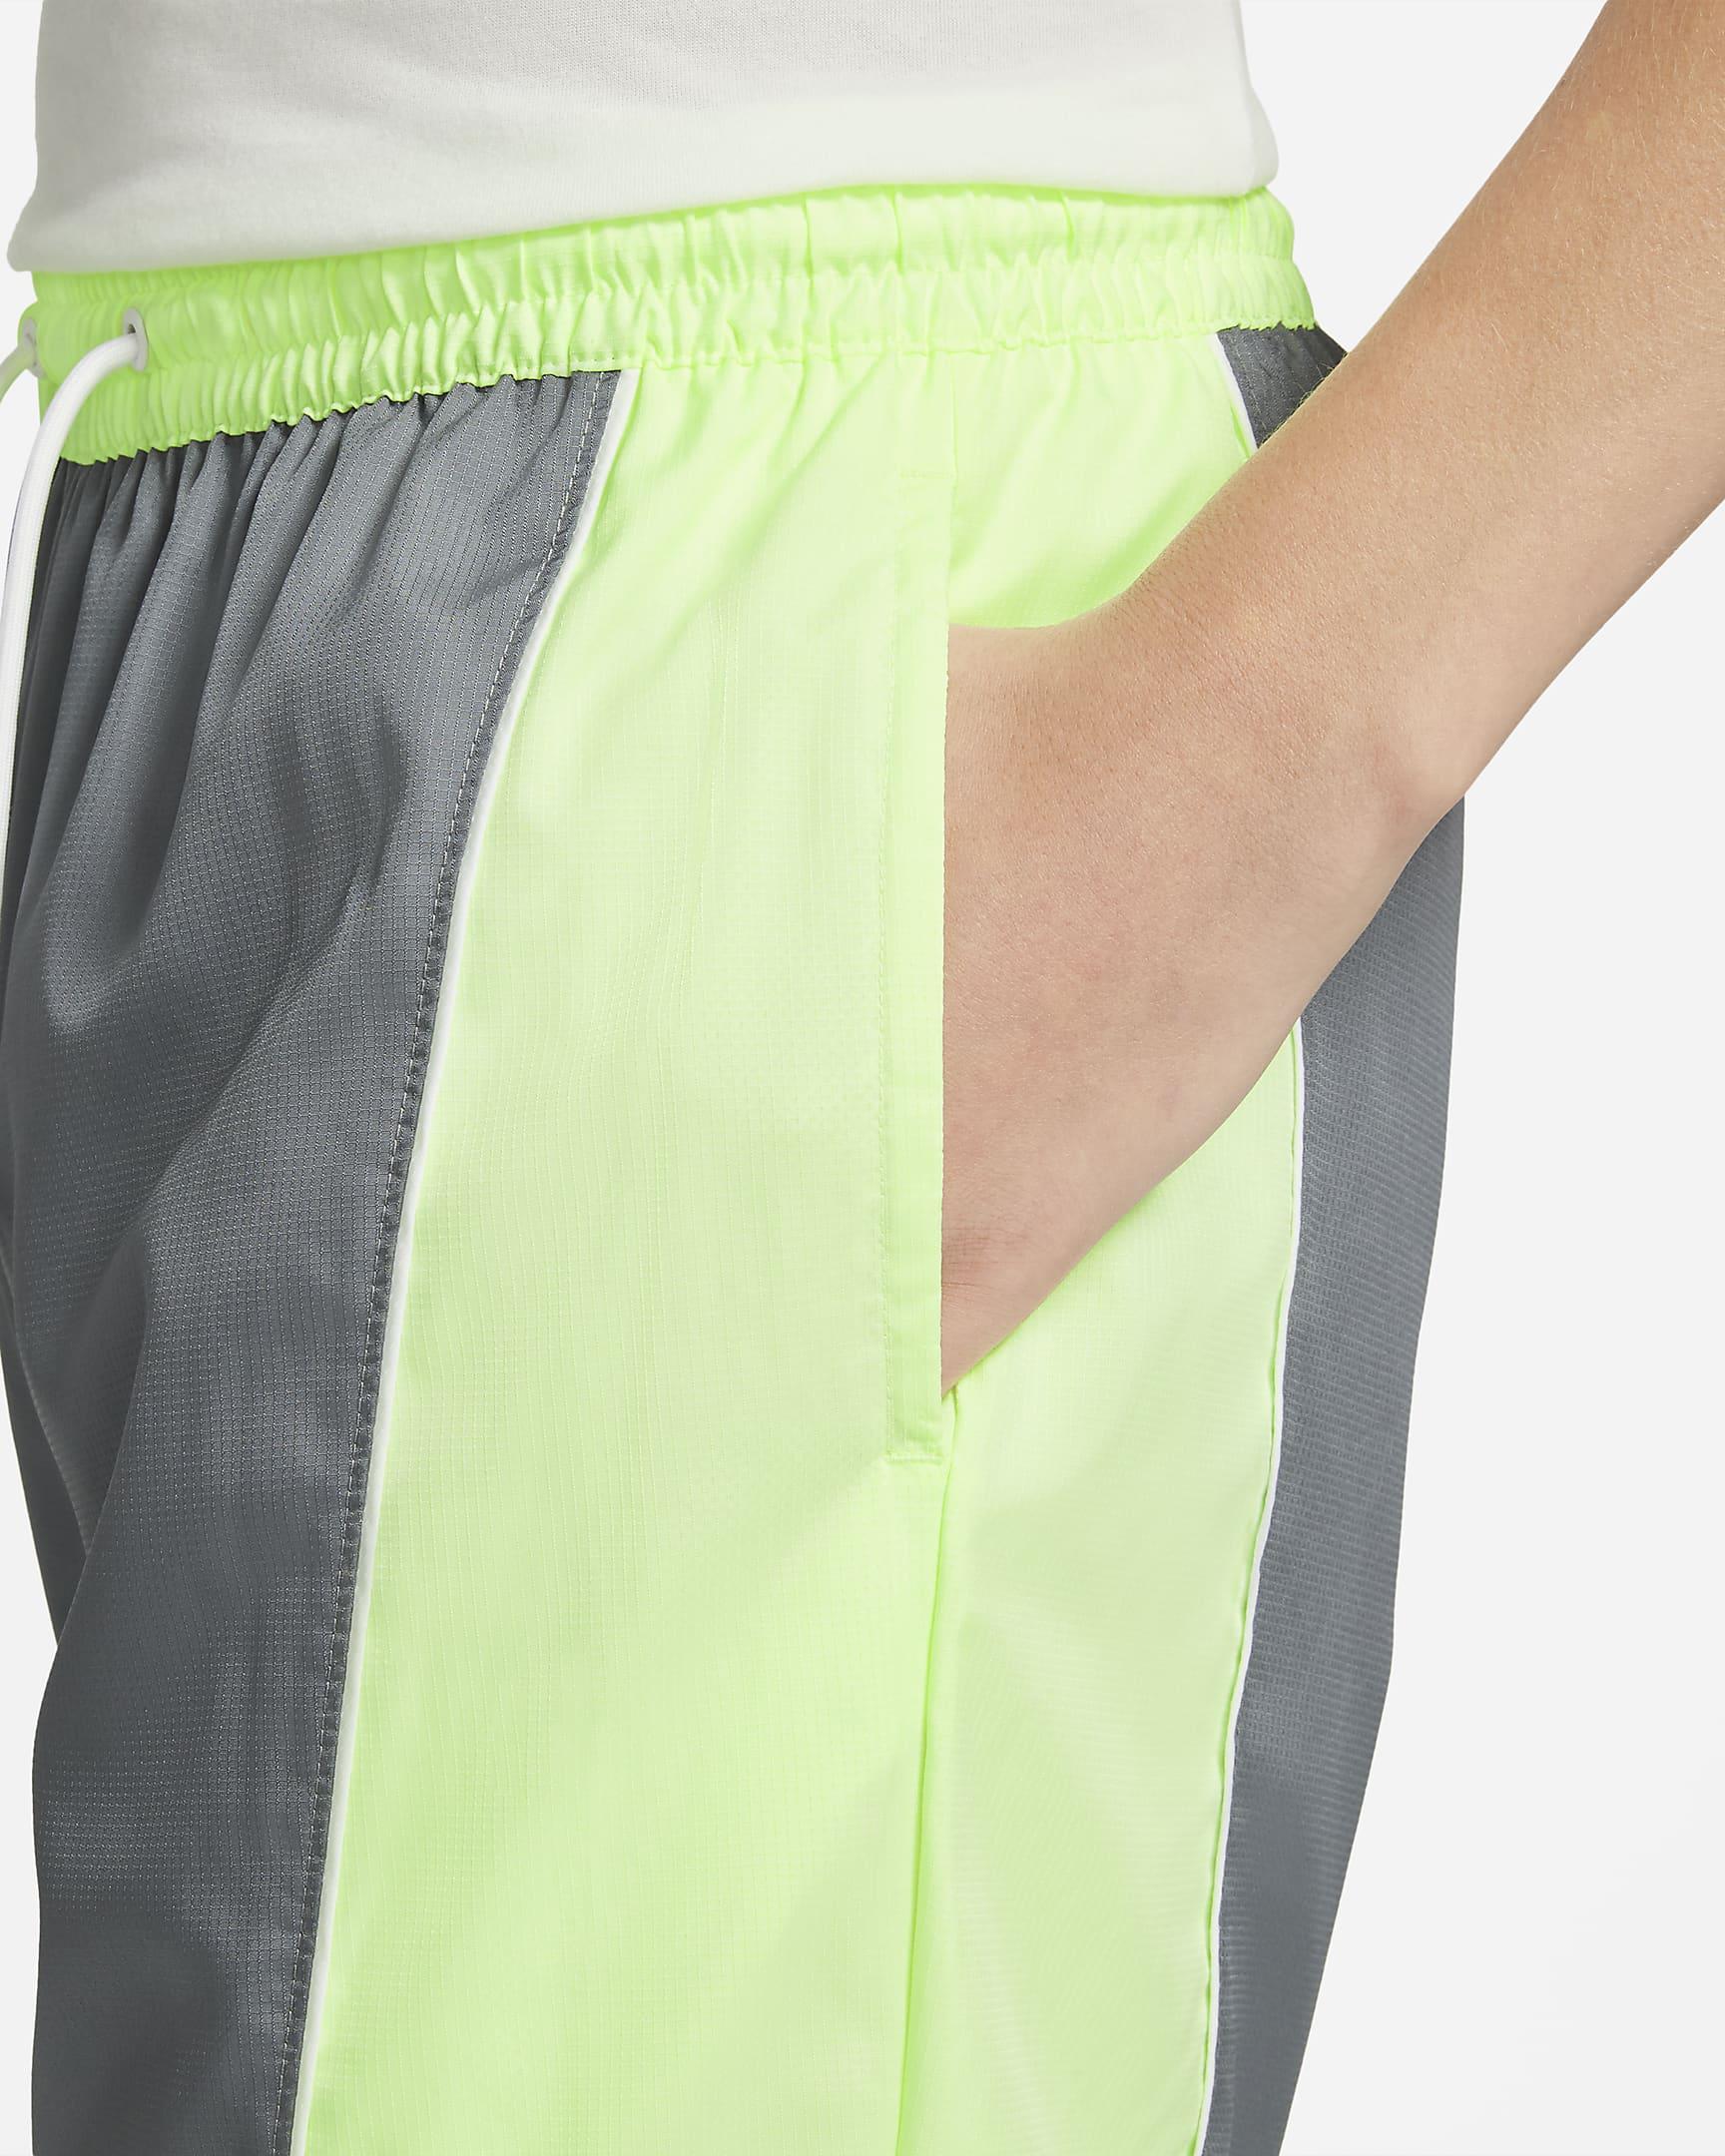 throwback-mens-basketball-pants-3cmwhW-1